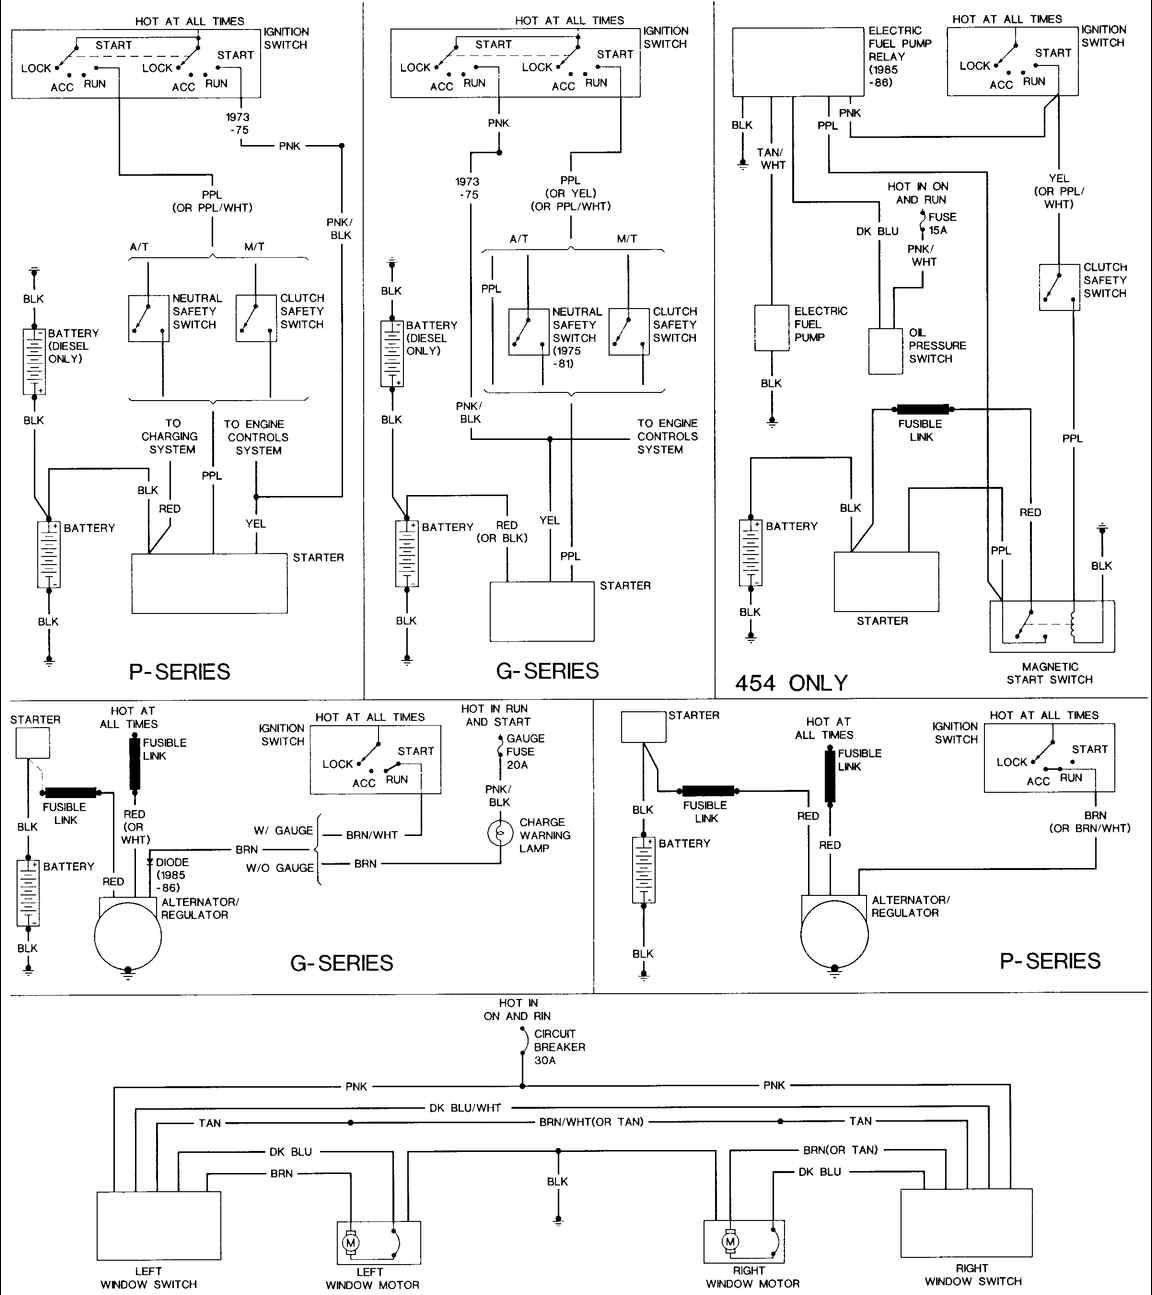 Super Chevy G30 Wiring Diagram General Wiring Diagram Data Wiring Cloud Onicaalyptbenolwigegmohammedshrineorg